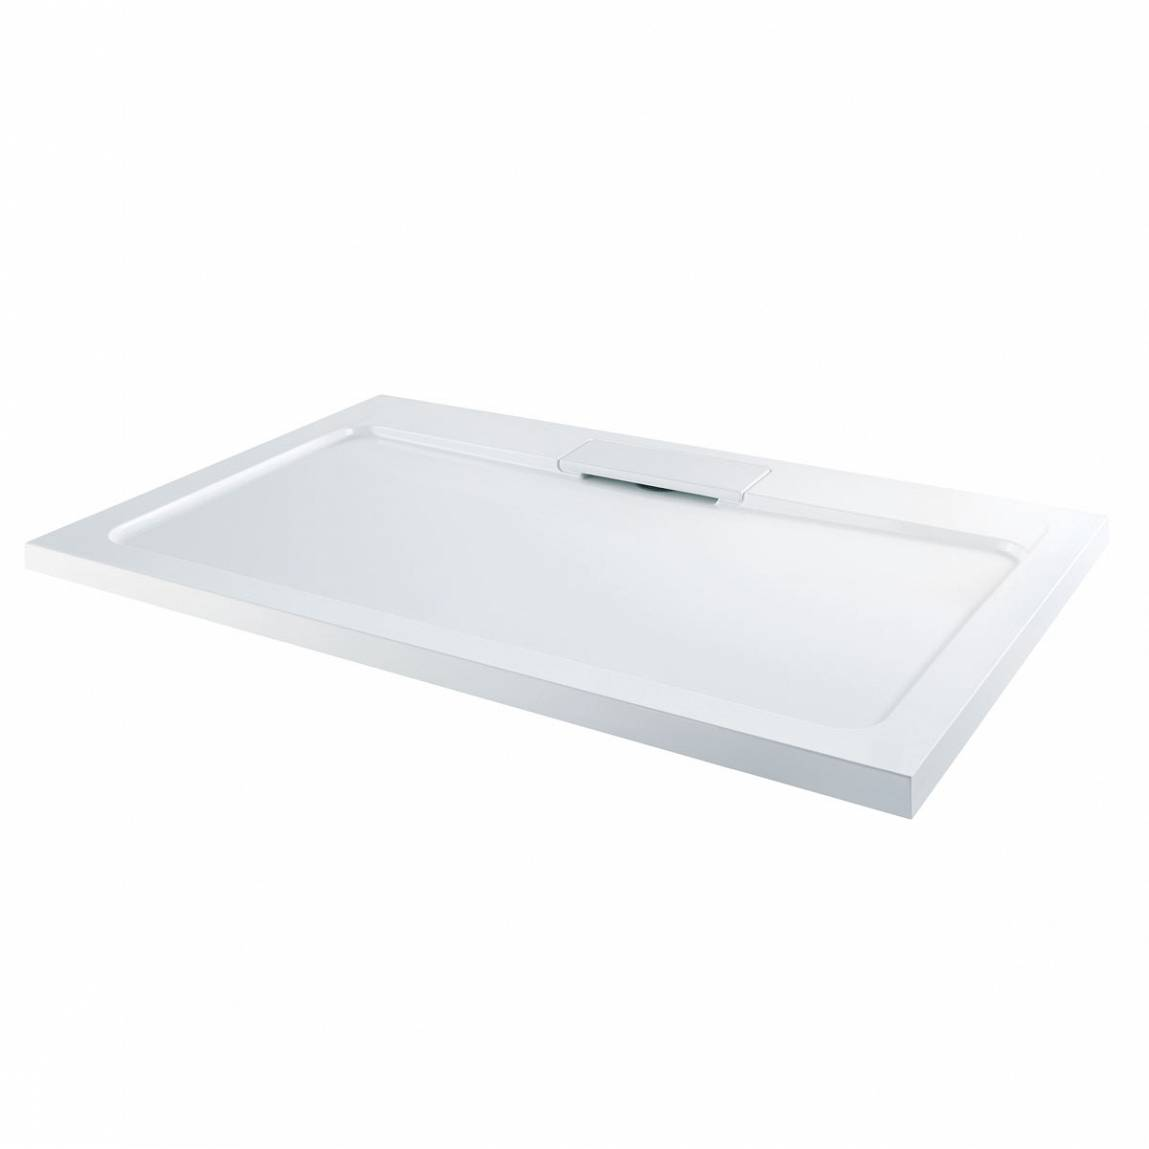 Image of Designer Rectangular Stone Shower Tray 1200 x 800